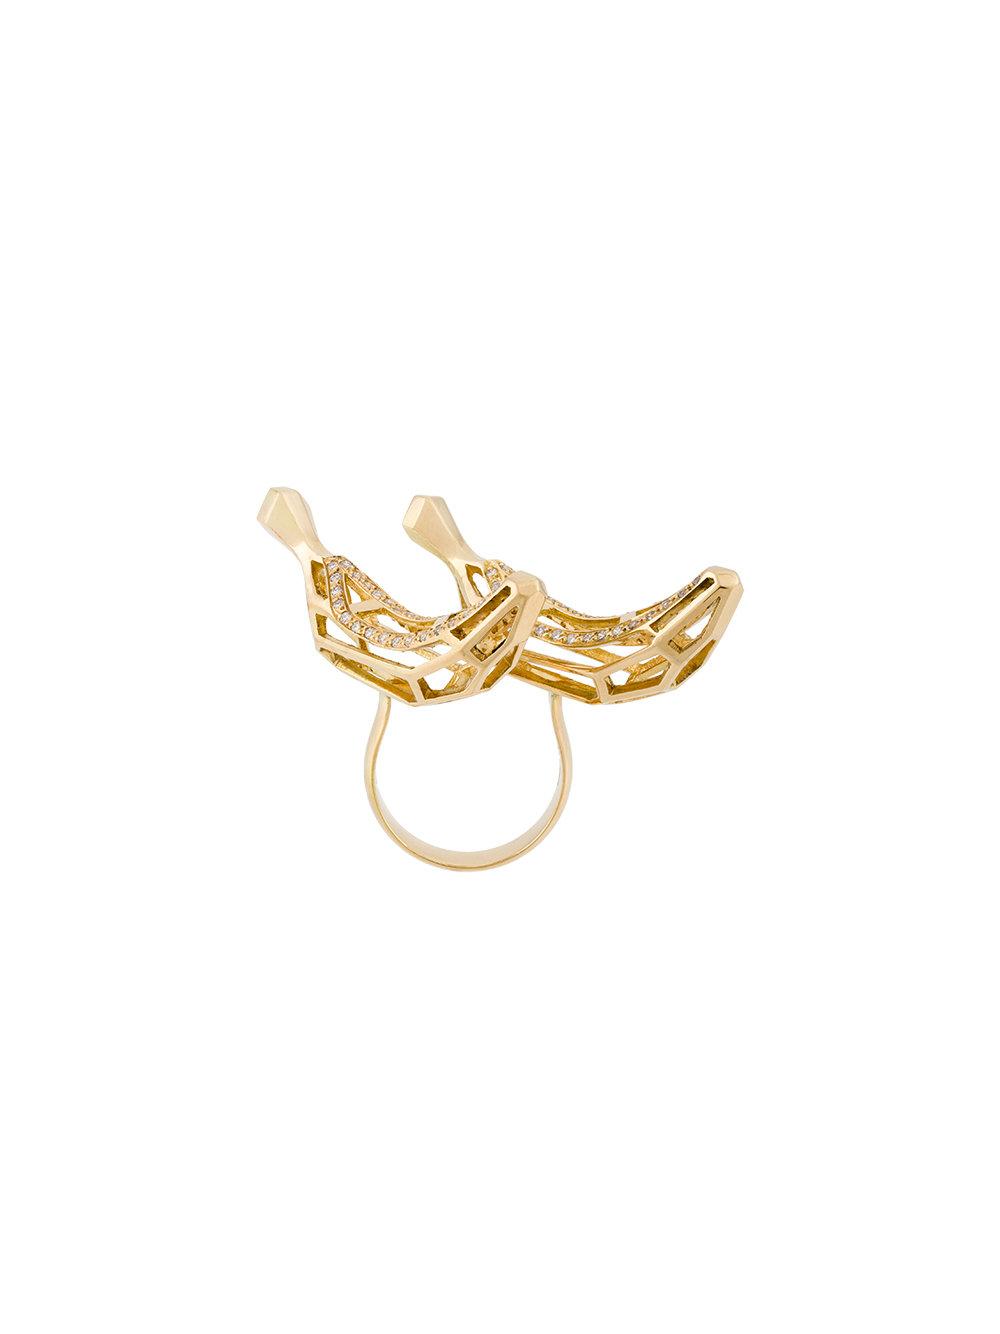 NATASHA ZINKO Double Banana ring, FarFetch.com